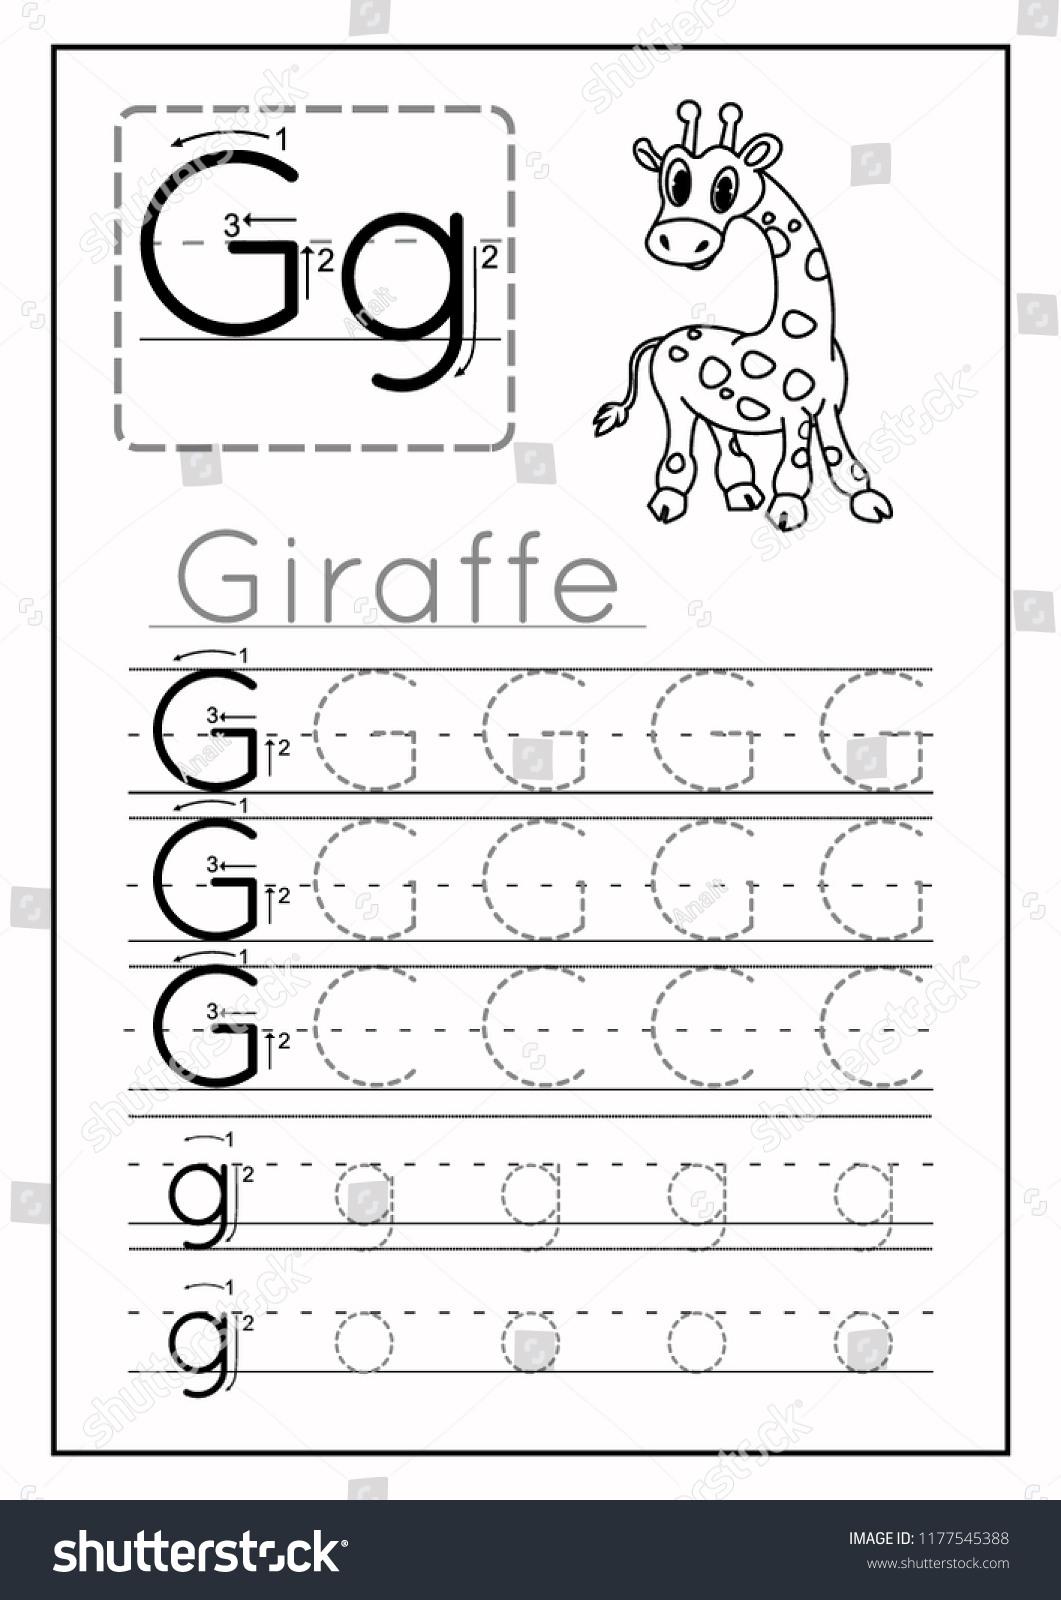 Writing Practice Letter G Printable Worksheet Stock Vector